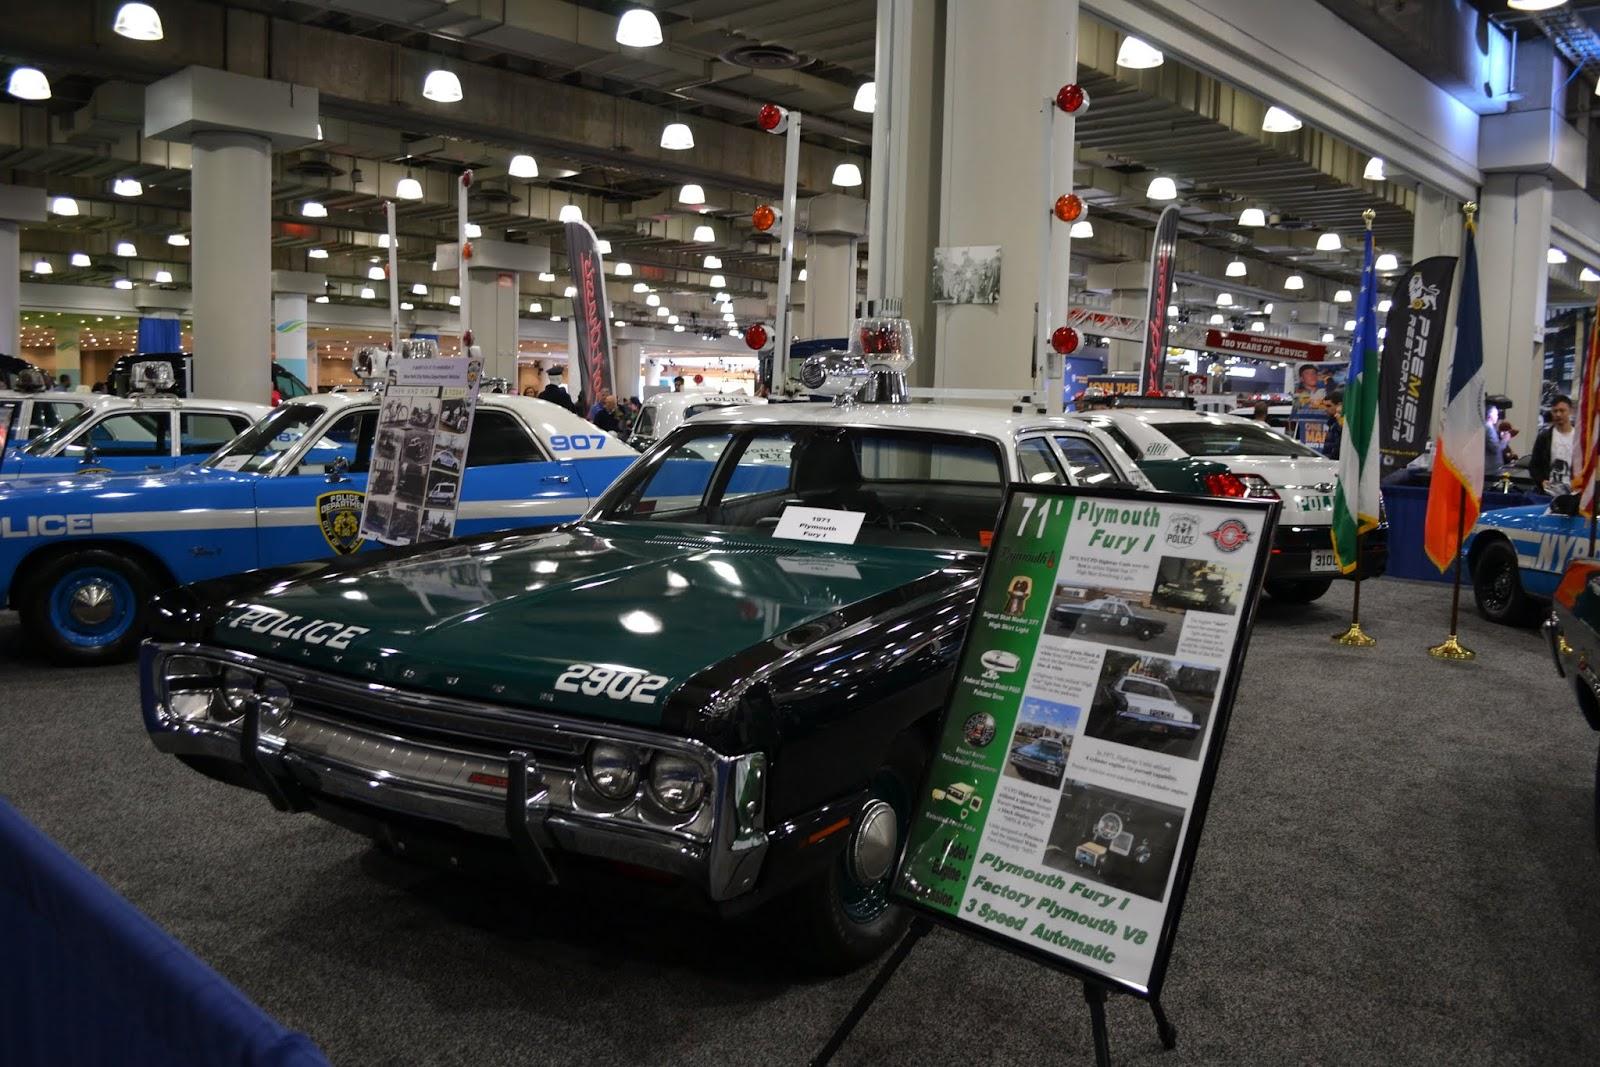 Plymouth Fury 1, 1971 года. Ежегодное автошоу в Нью-Йорке - 2015 (New York International Auto Show - 2015)